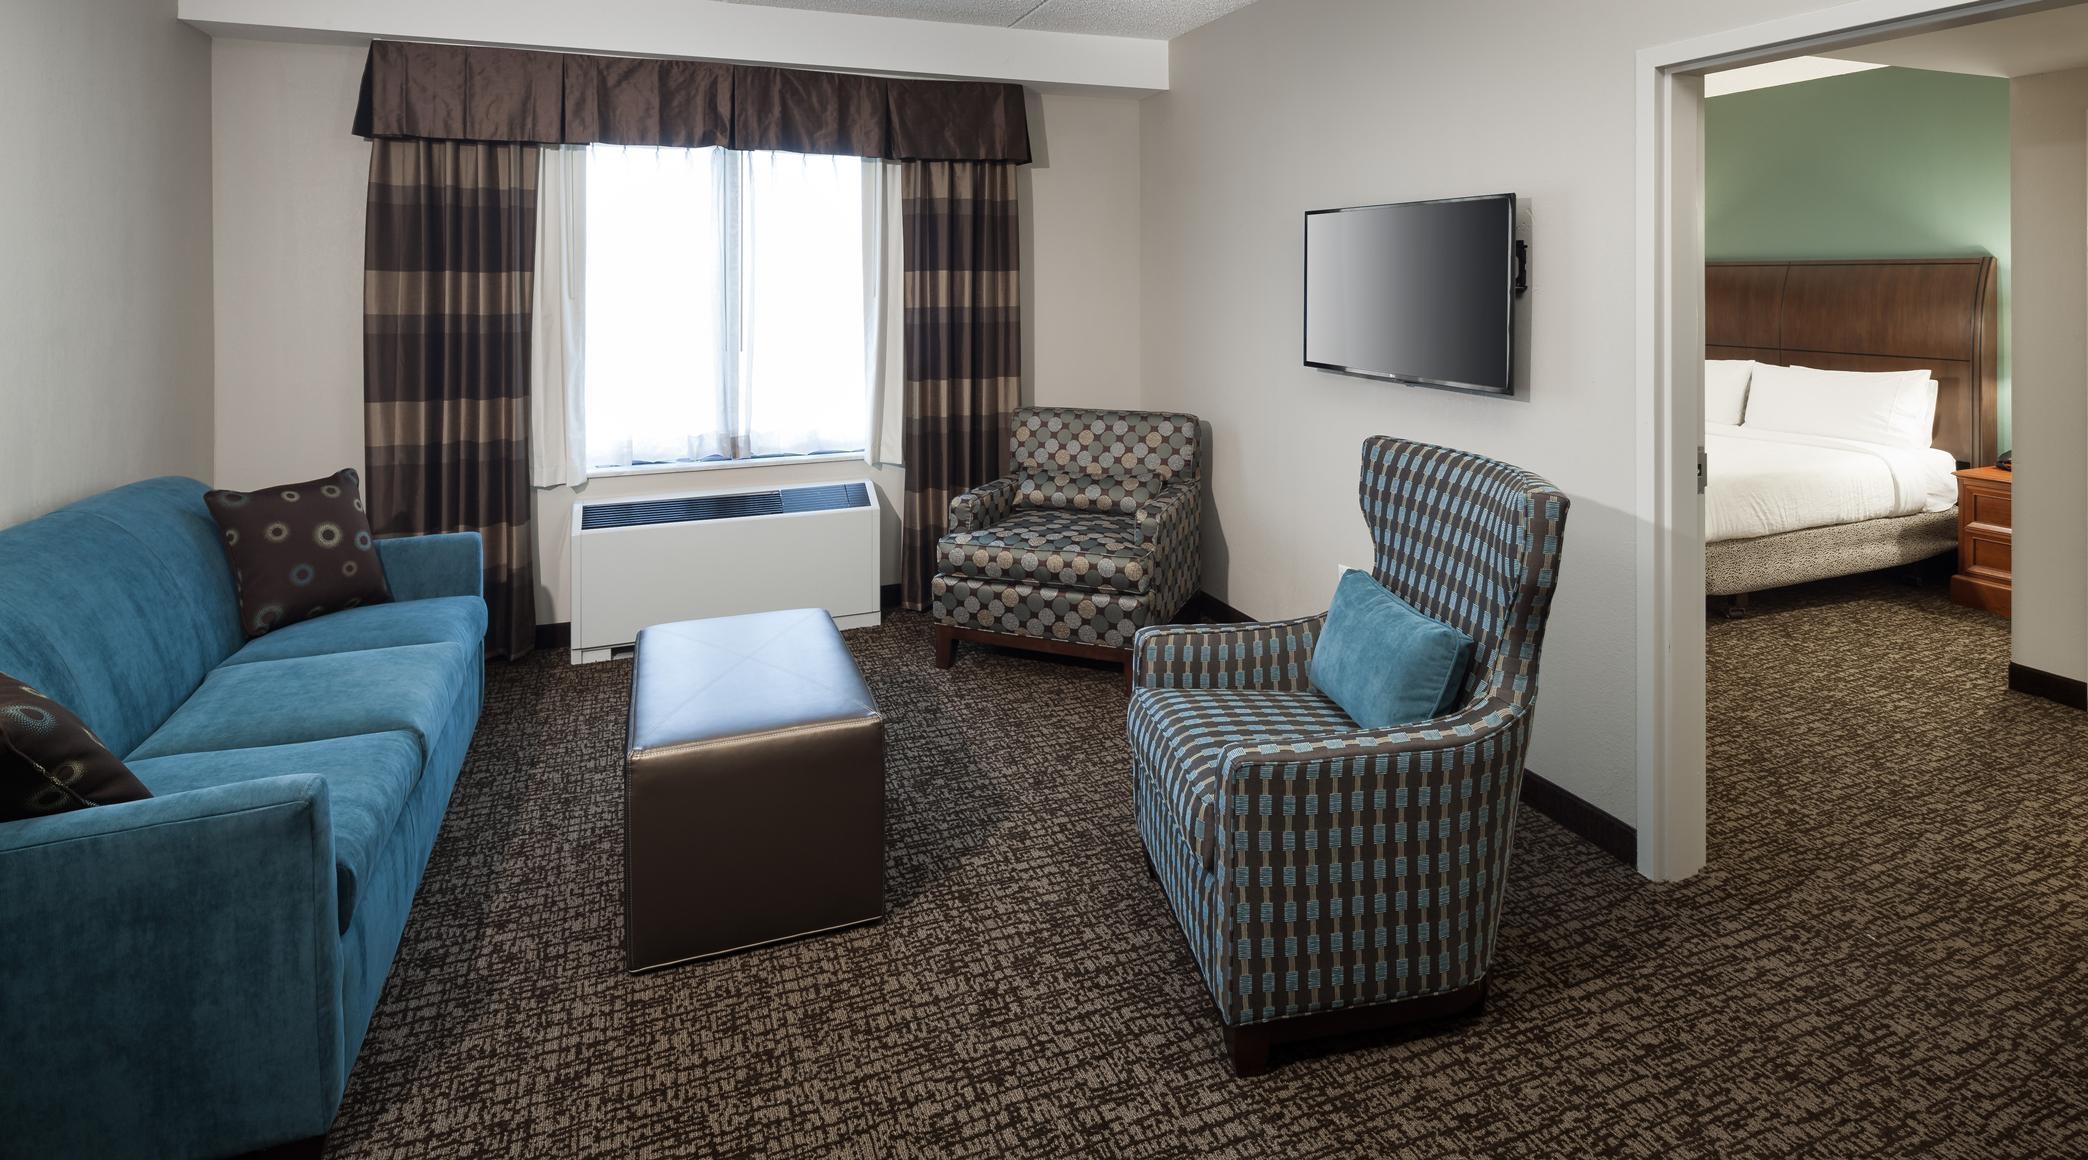 Hilton Garden Inn Rockaway image 22